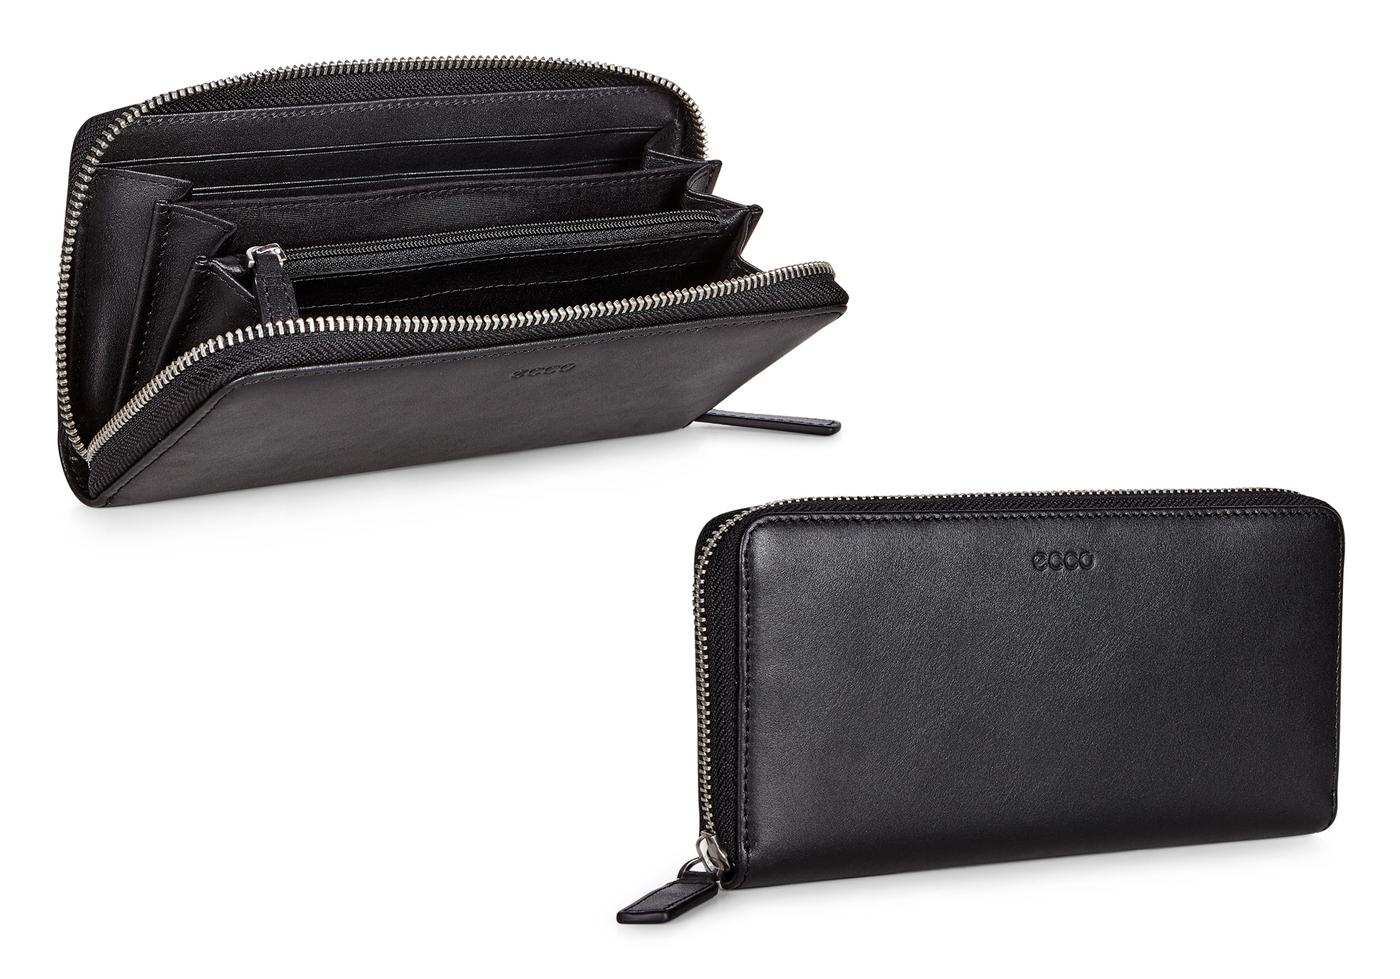 ECCO Hickson Large Zip Wallet